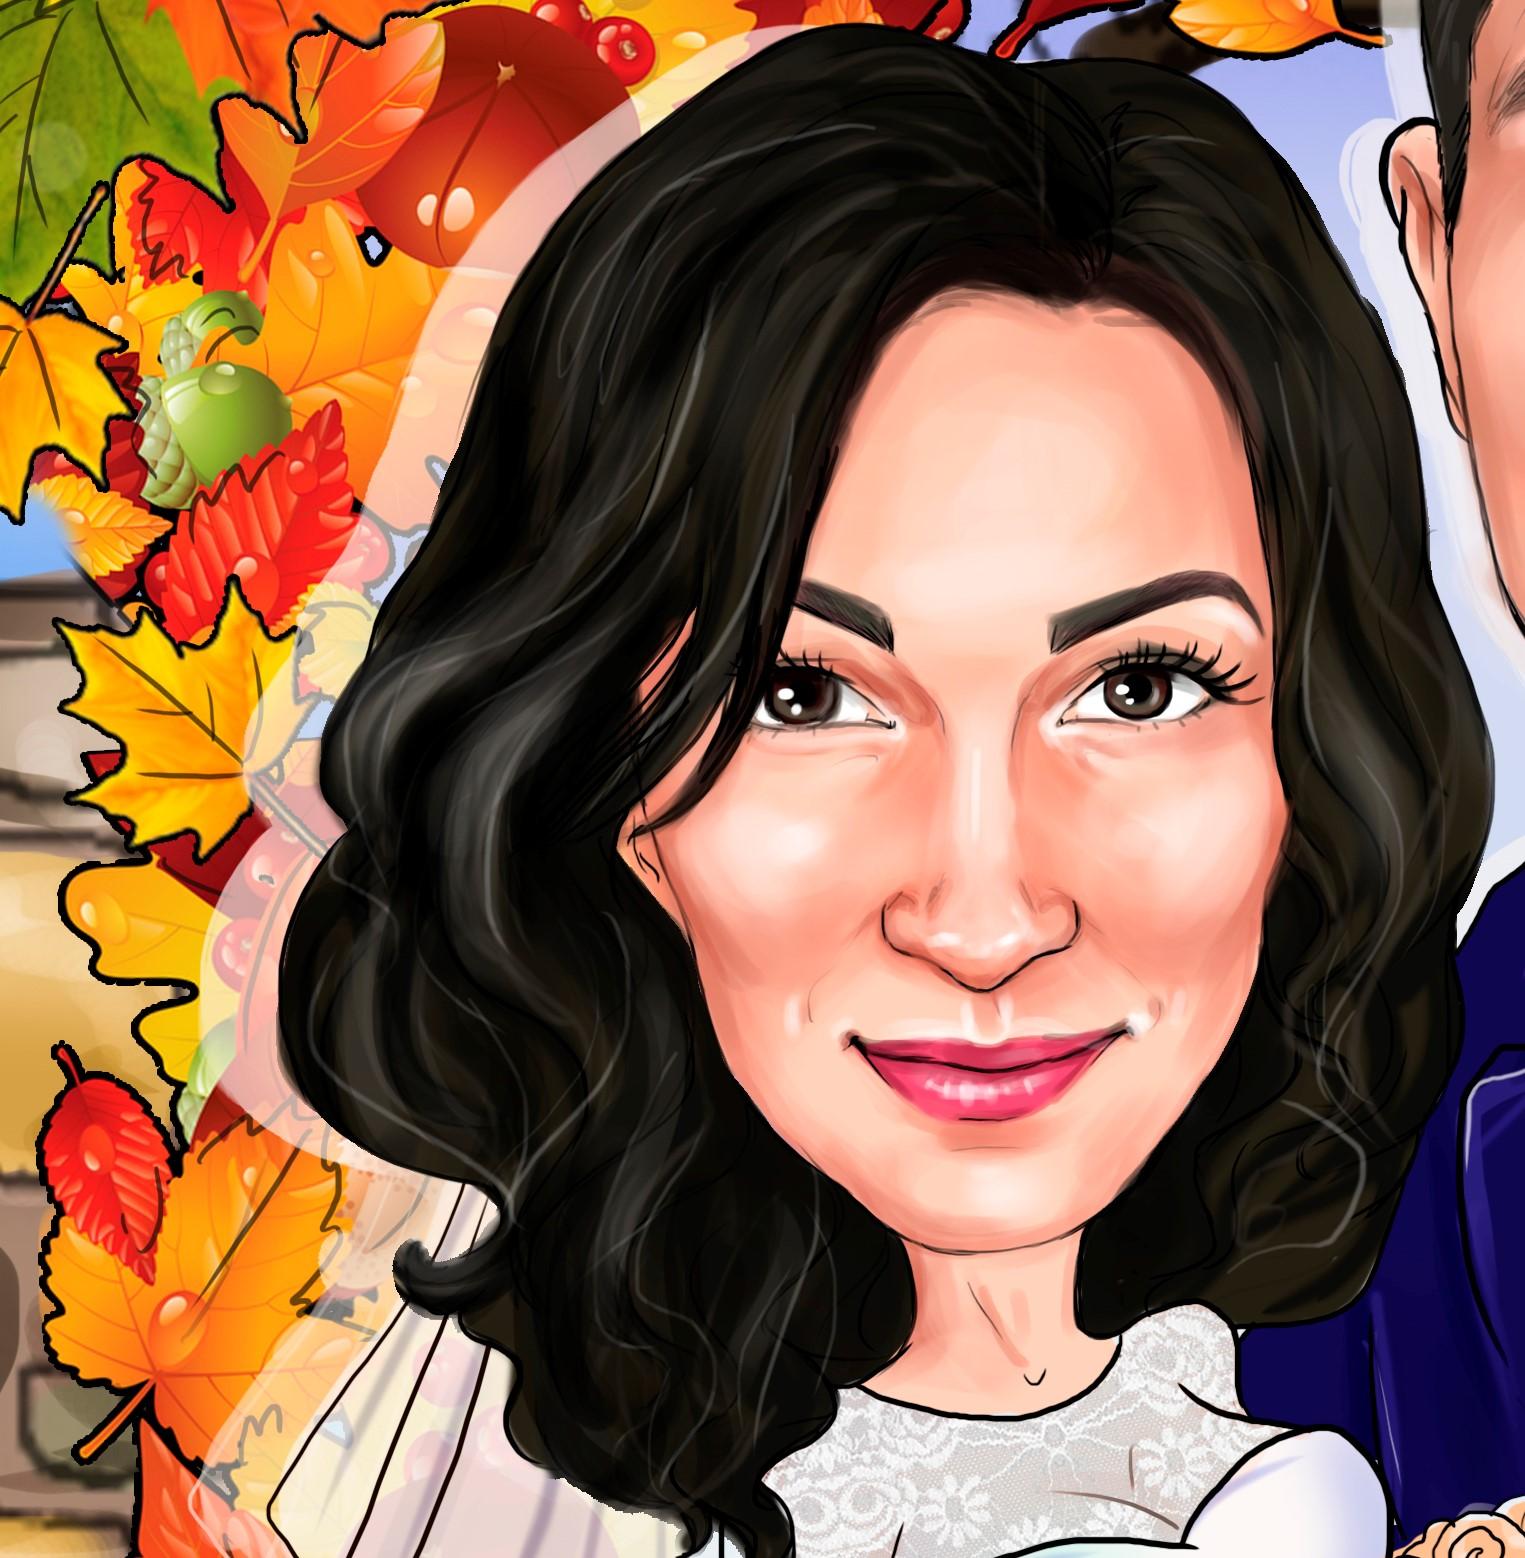 маникюр на свадьбу в бирюзовом цвете фото в